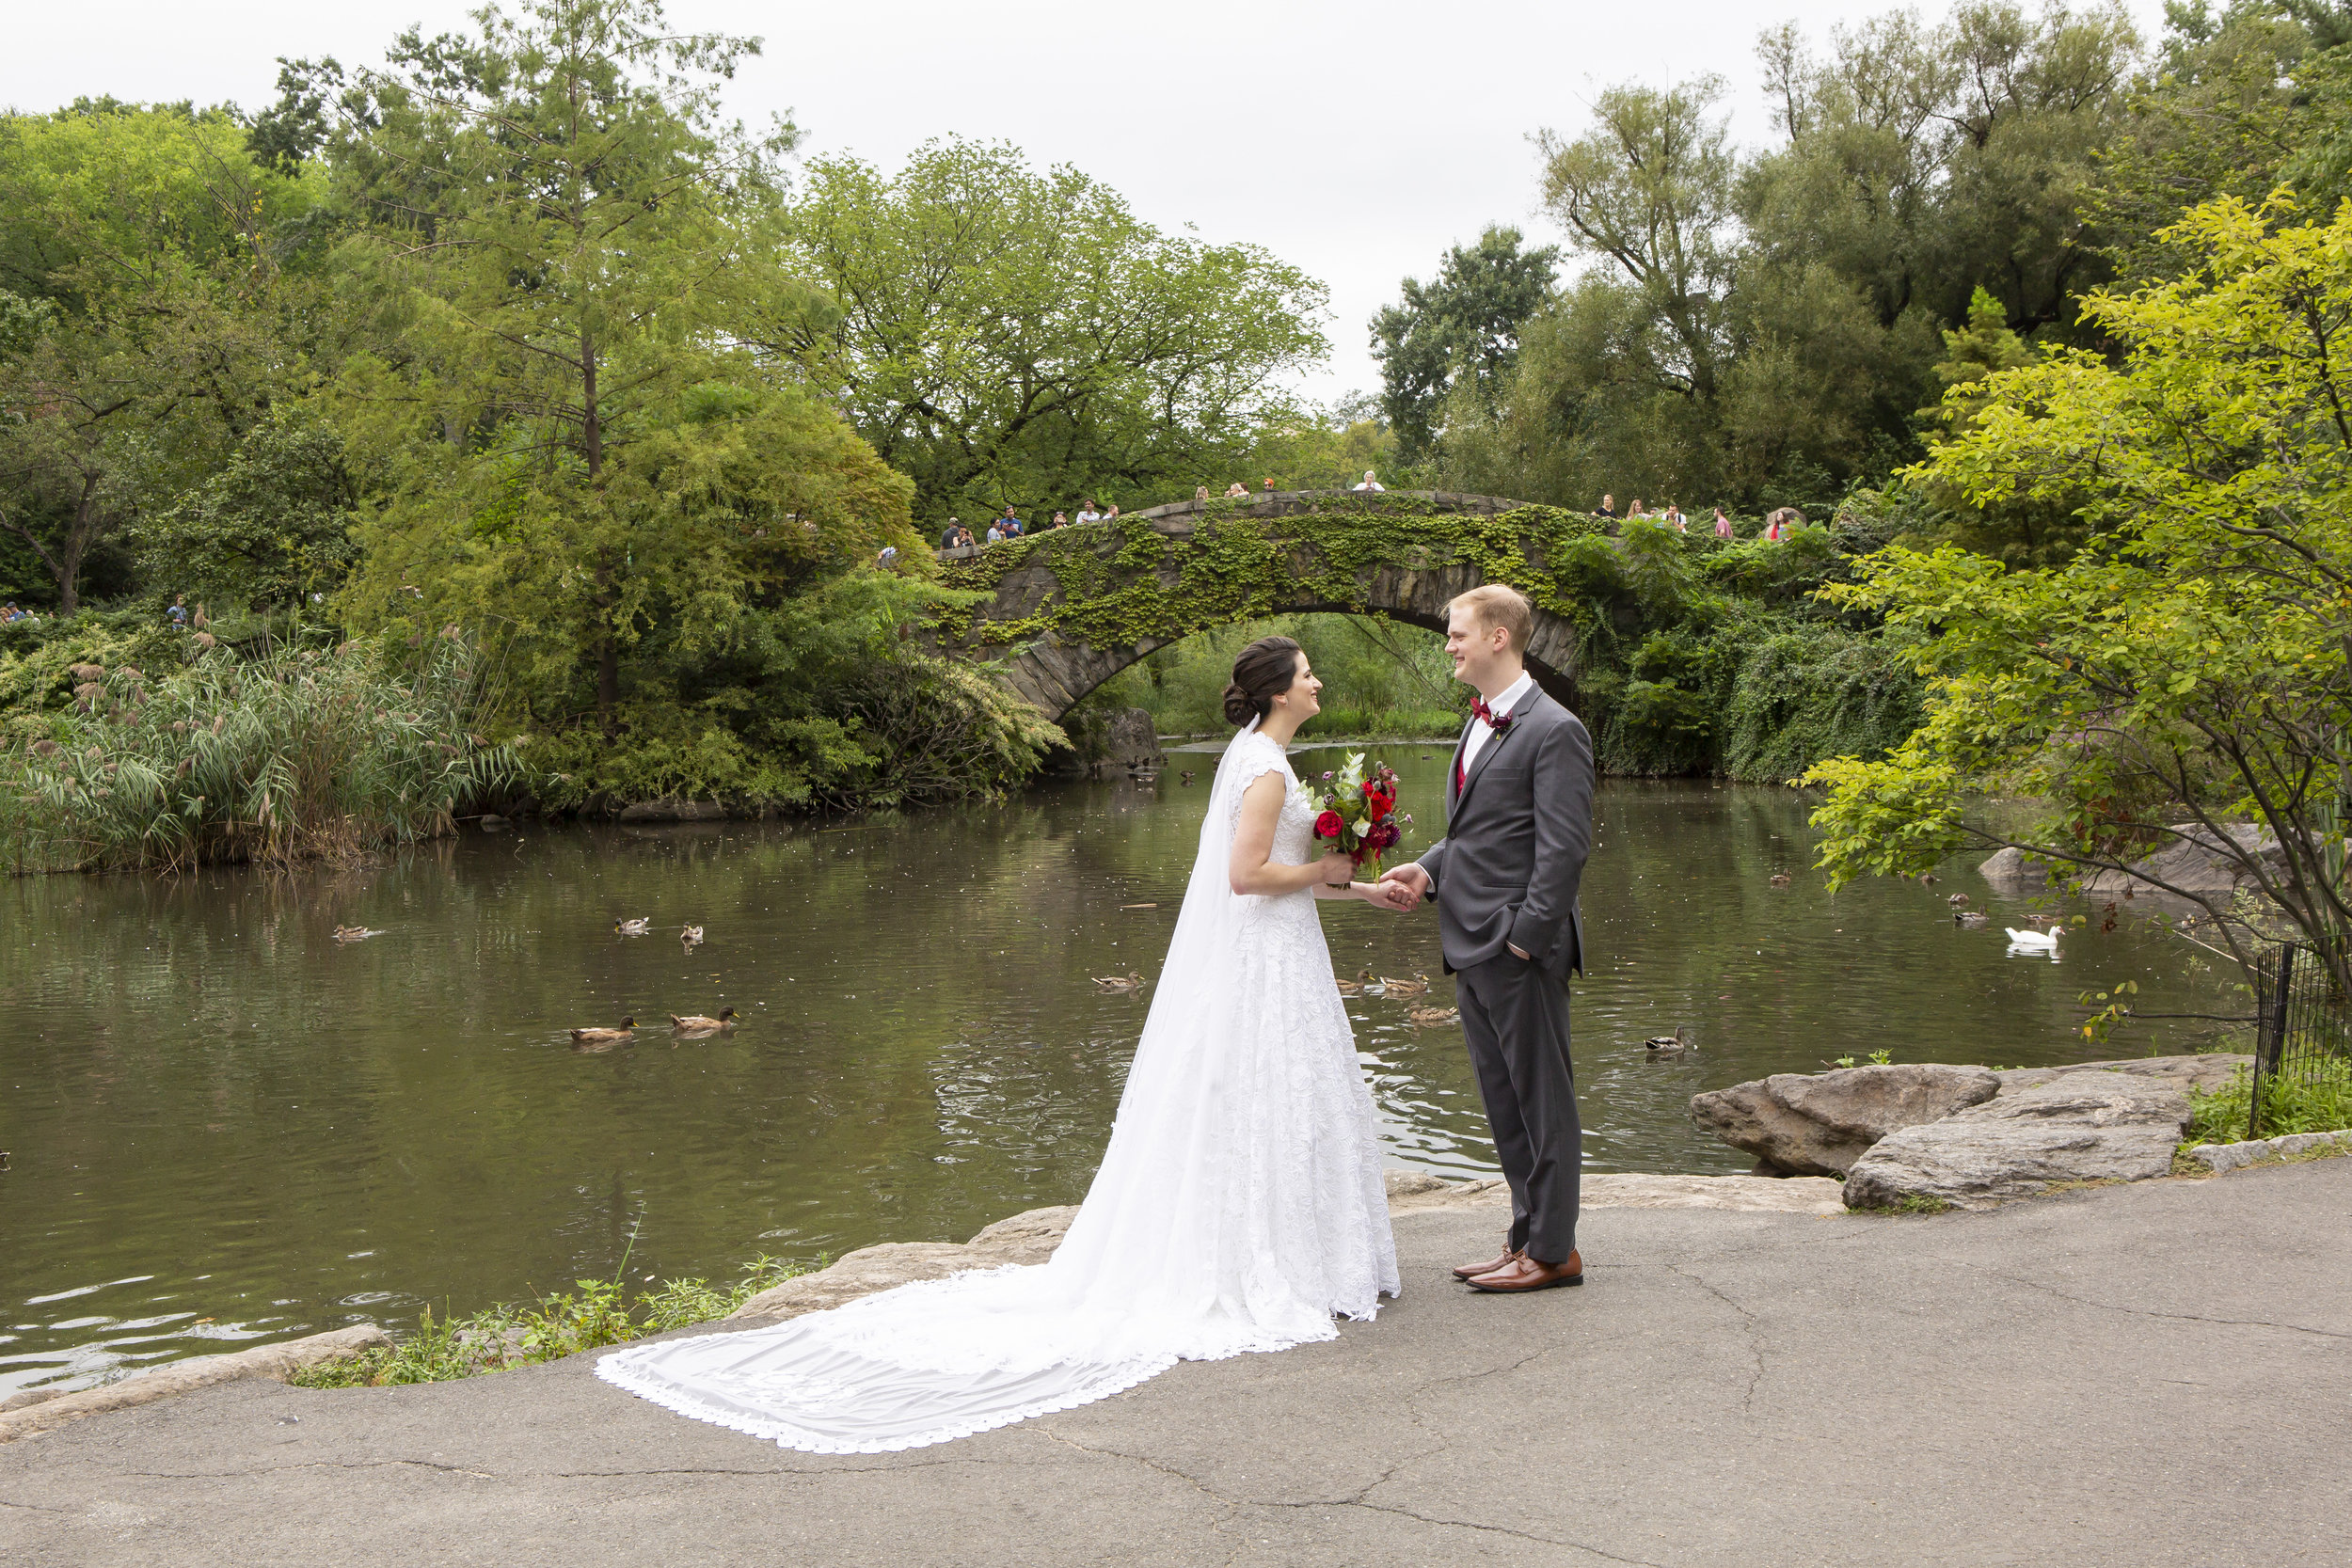 090718-015-ChiaraTom-Wedding-PhotobyAyanoHisa.jpg